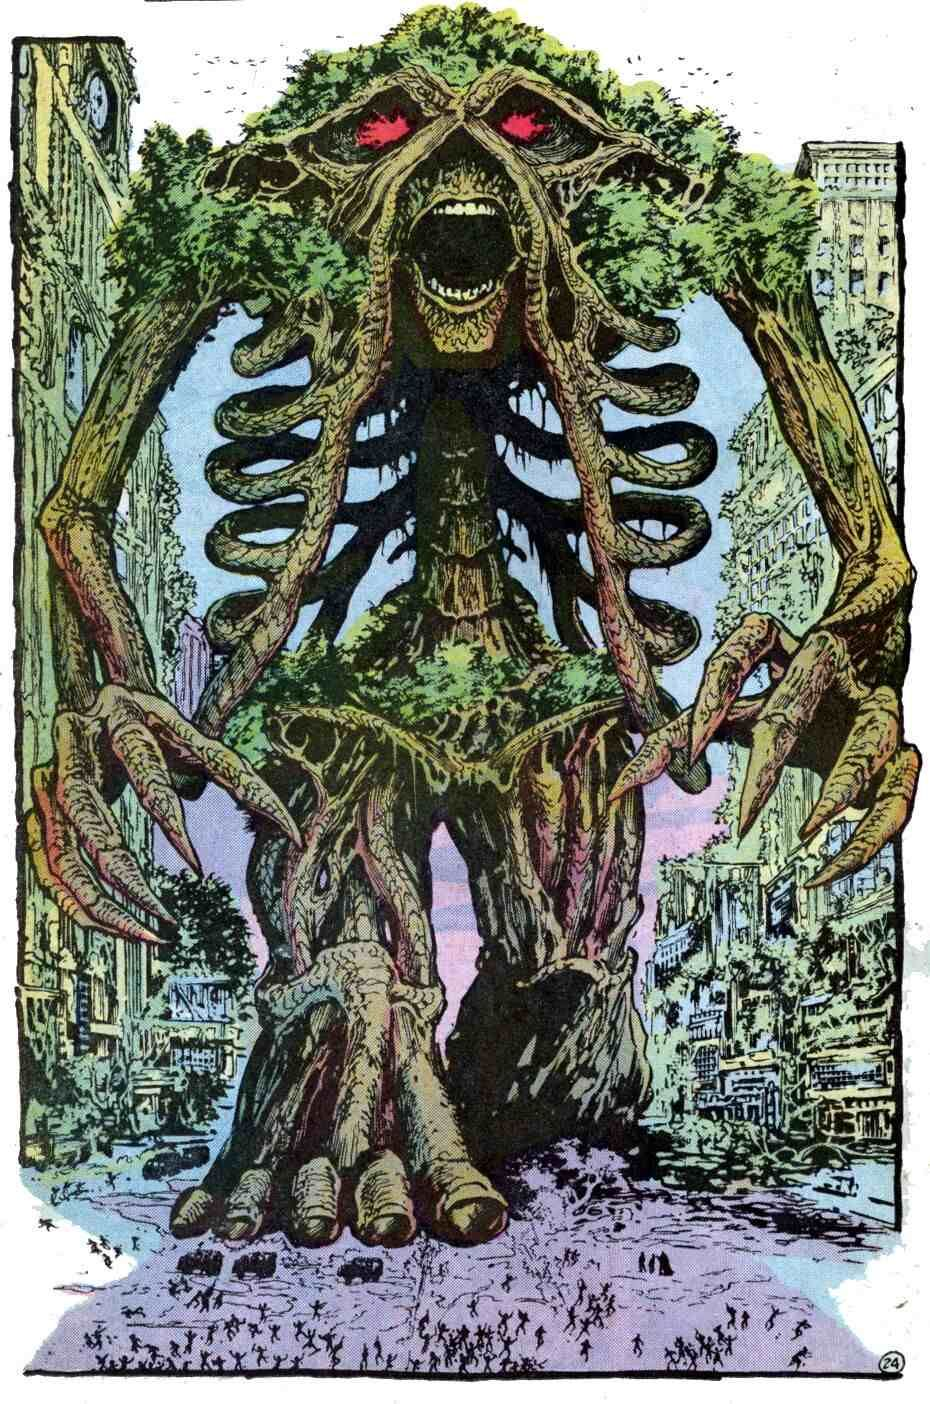 John Totleben art from the classic Swamp Thing #53 ...